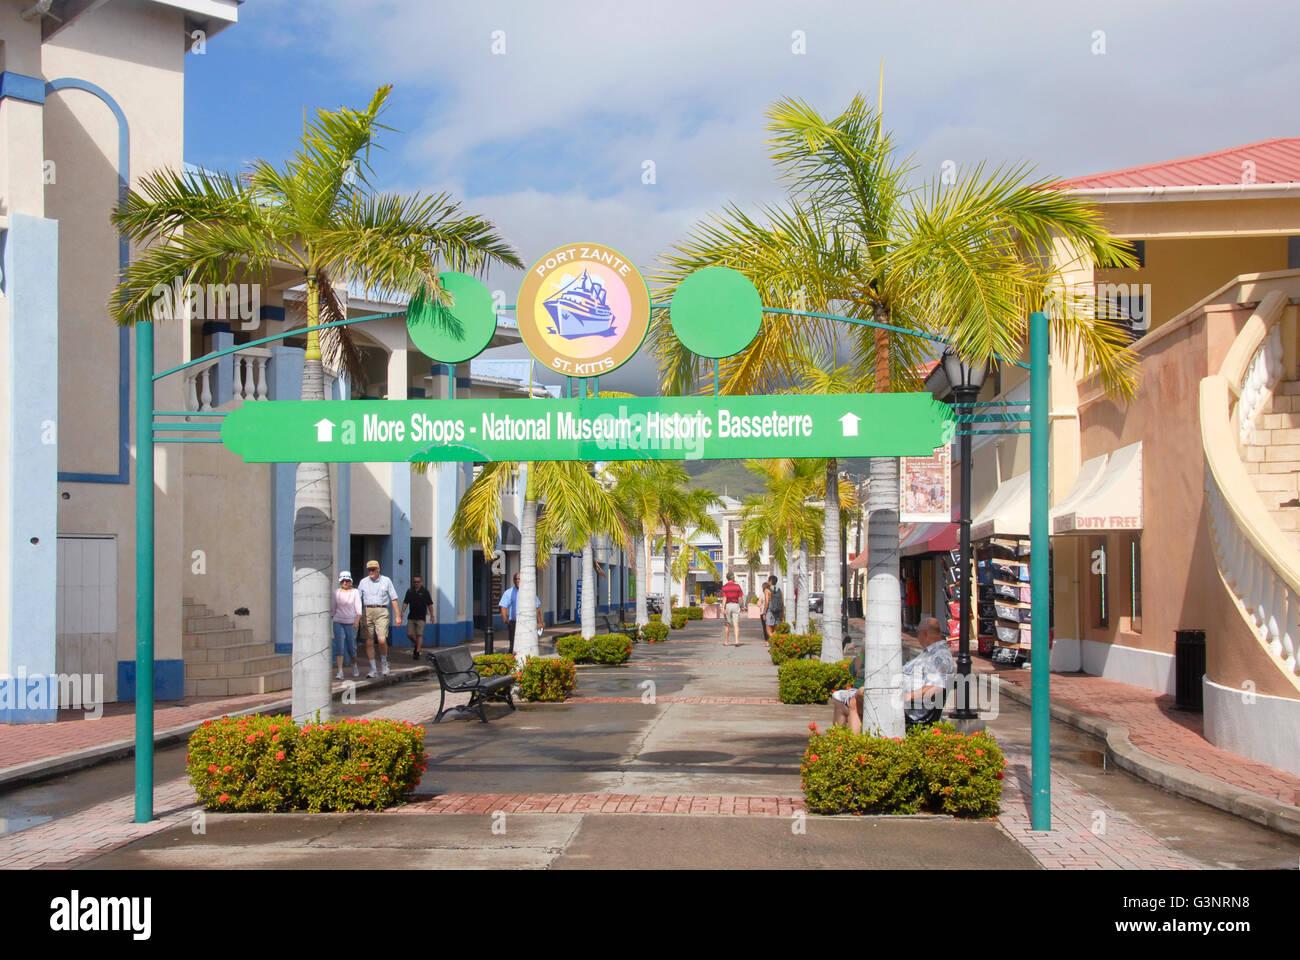 Shopping area port zante st kitts caribbean stock photo for Port zante st kitts